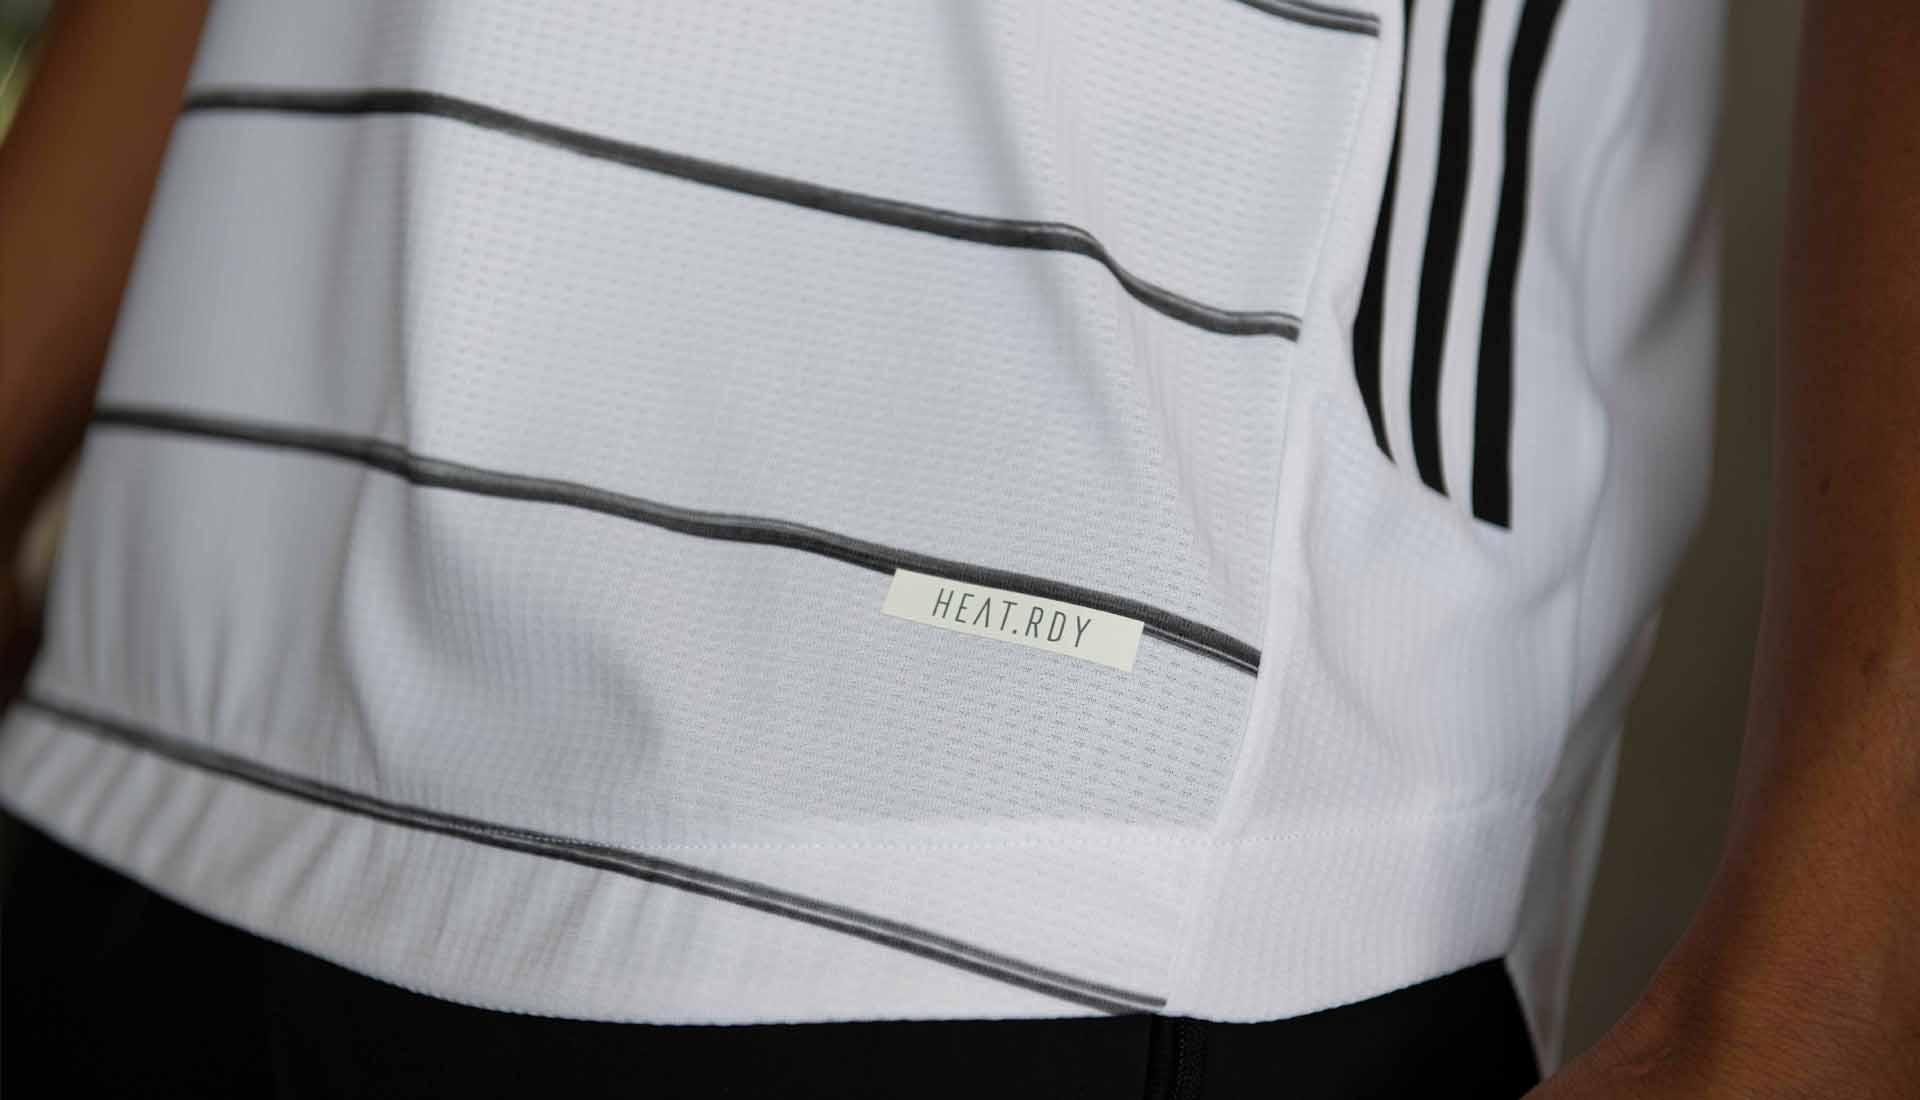 https://www.soccerbible.com/media/103321/6-germany-2020-home-shirt-min.jpg